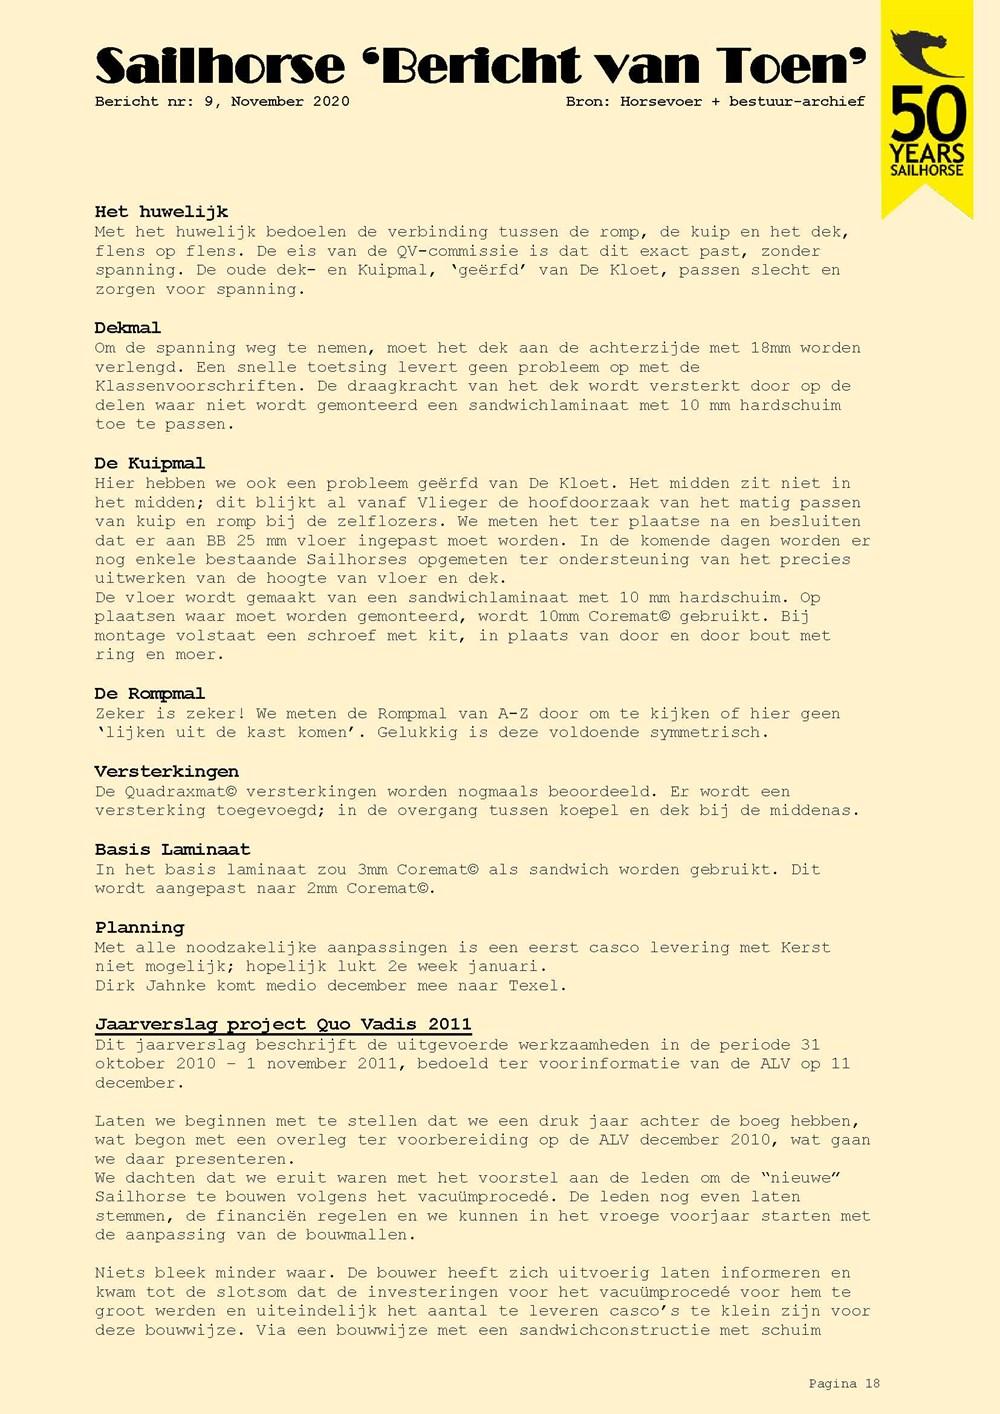 BvT09_Page_18.jpg